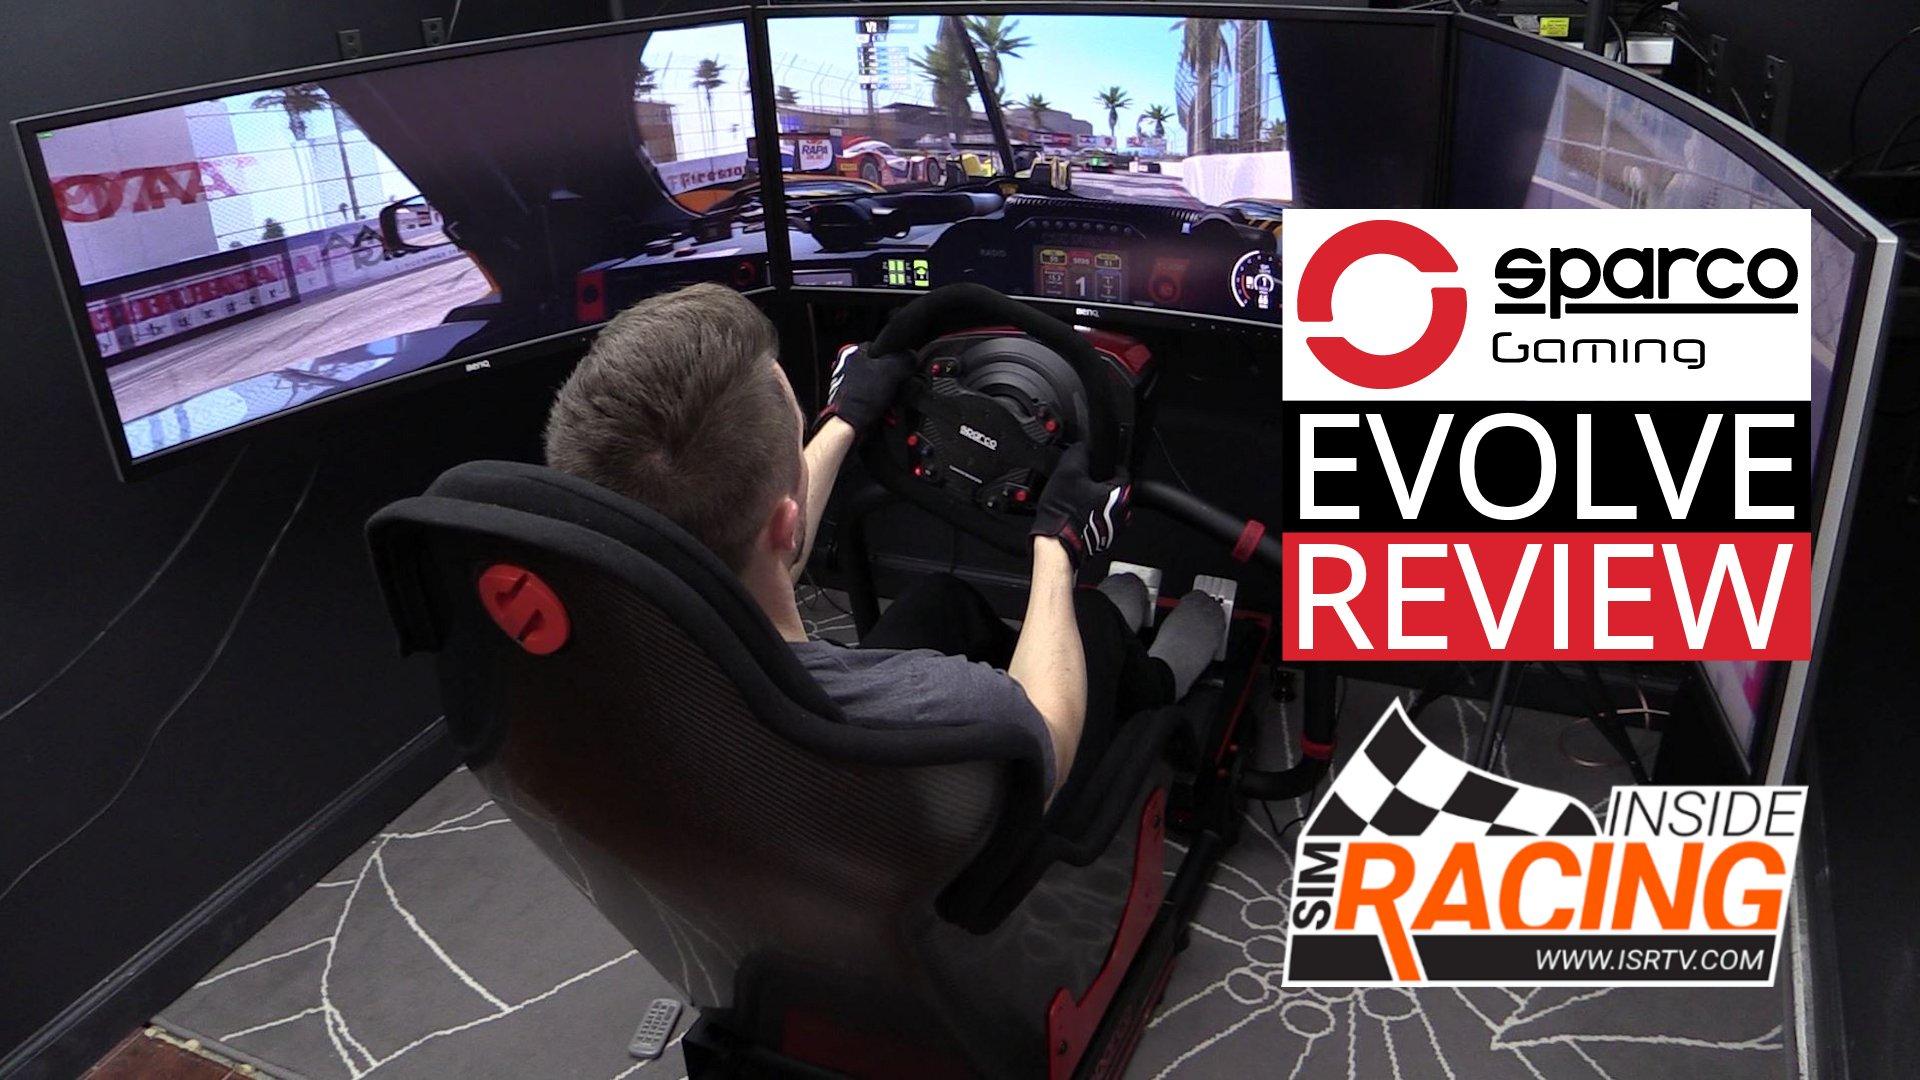 Sparco Evolve Racing Simulator Review - Inside Sim Racing